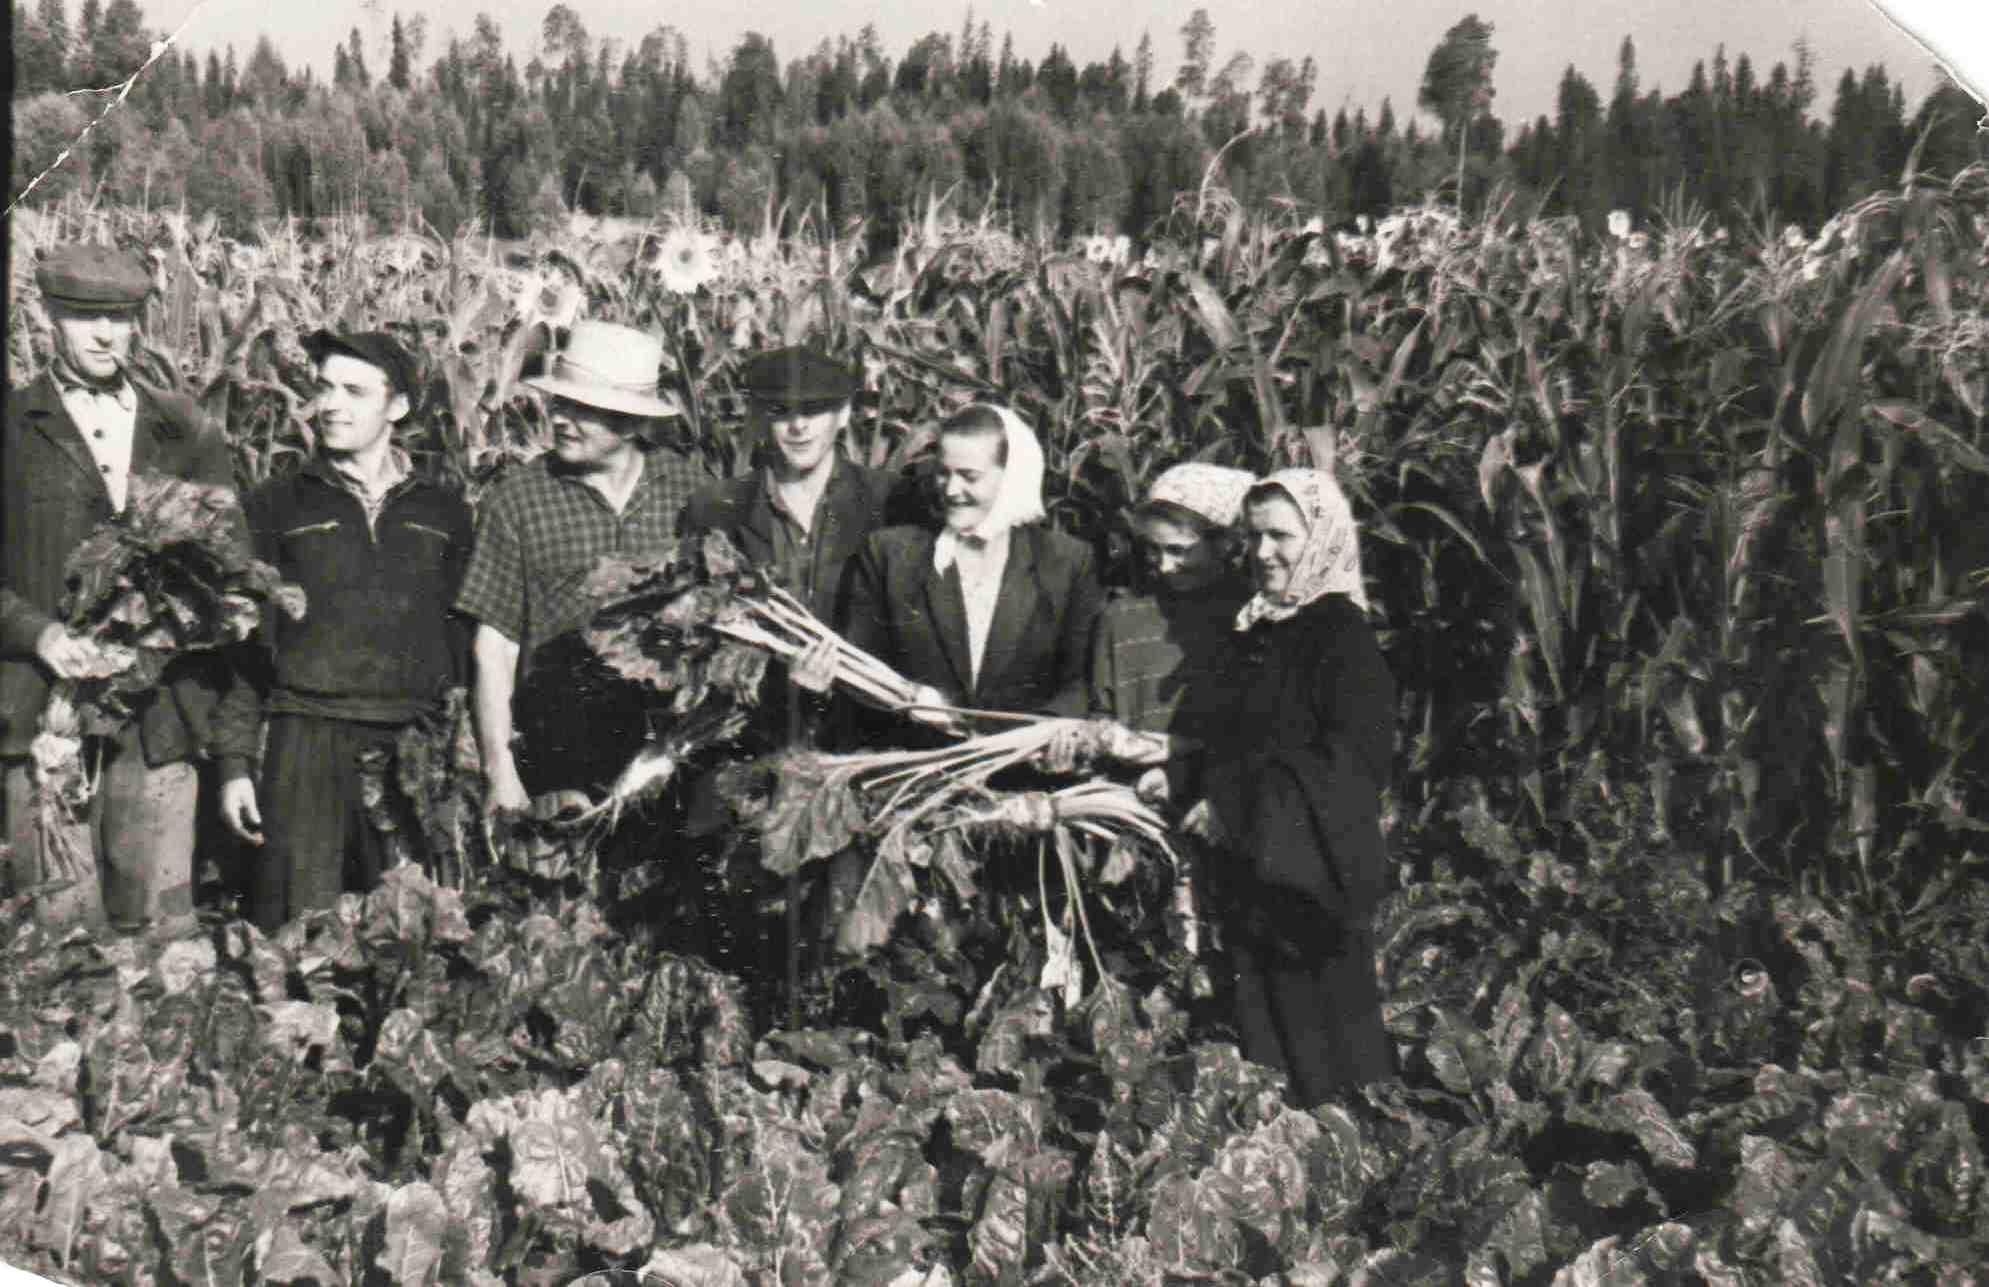 1963. осень. п. Вандыш. Сбор турнепса, свеклы.